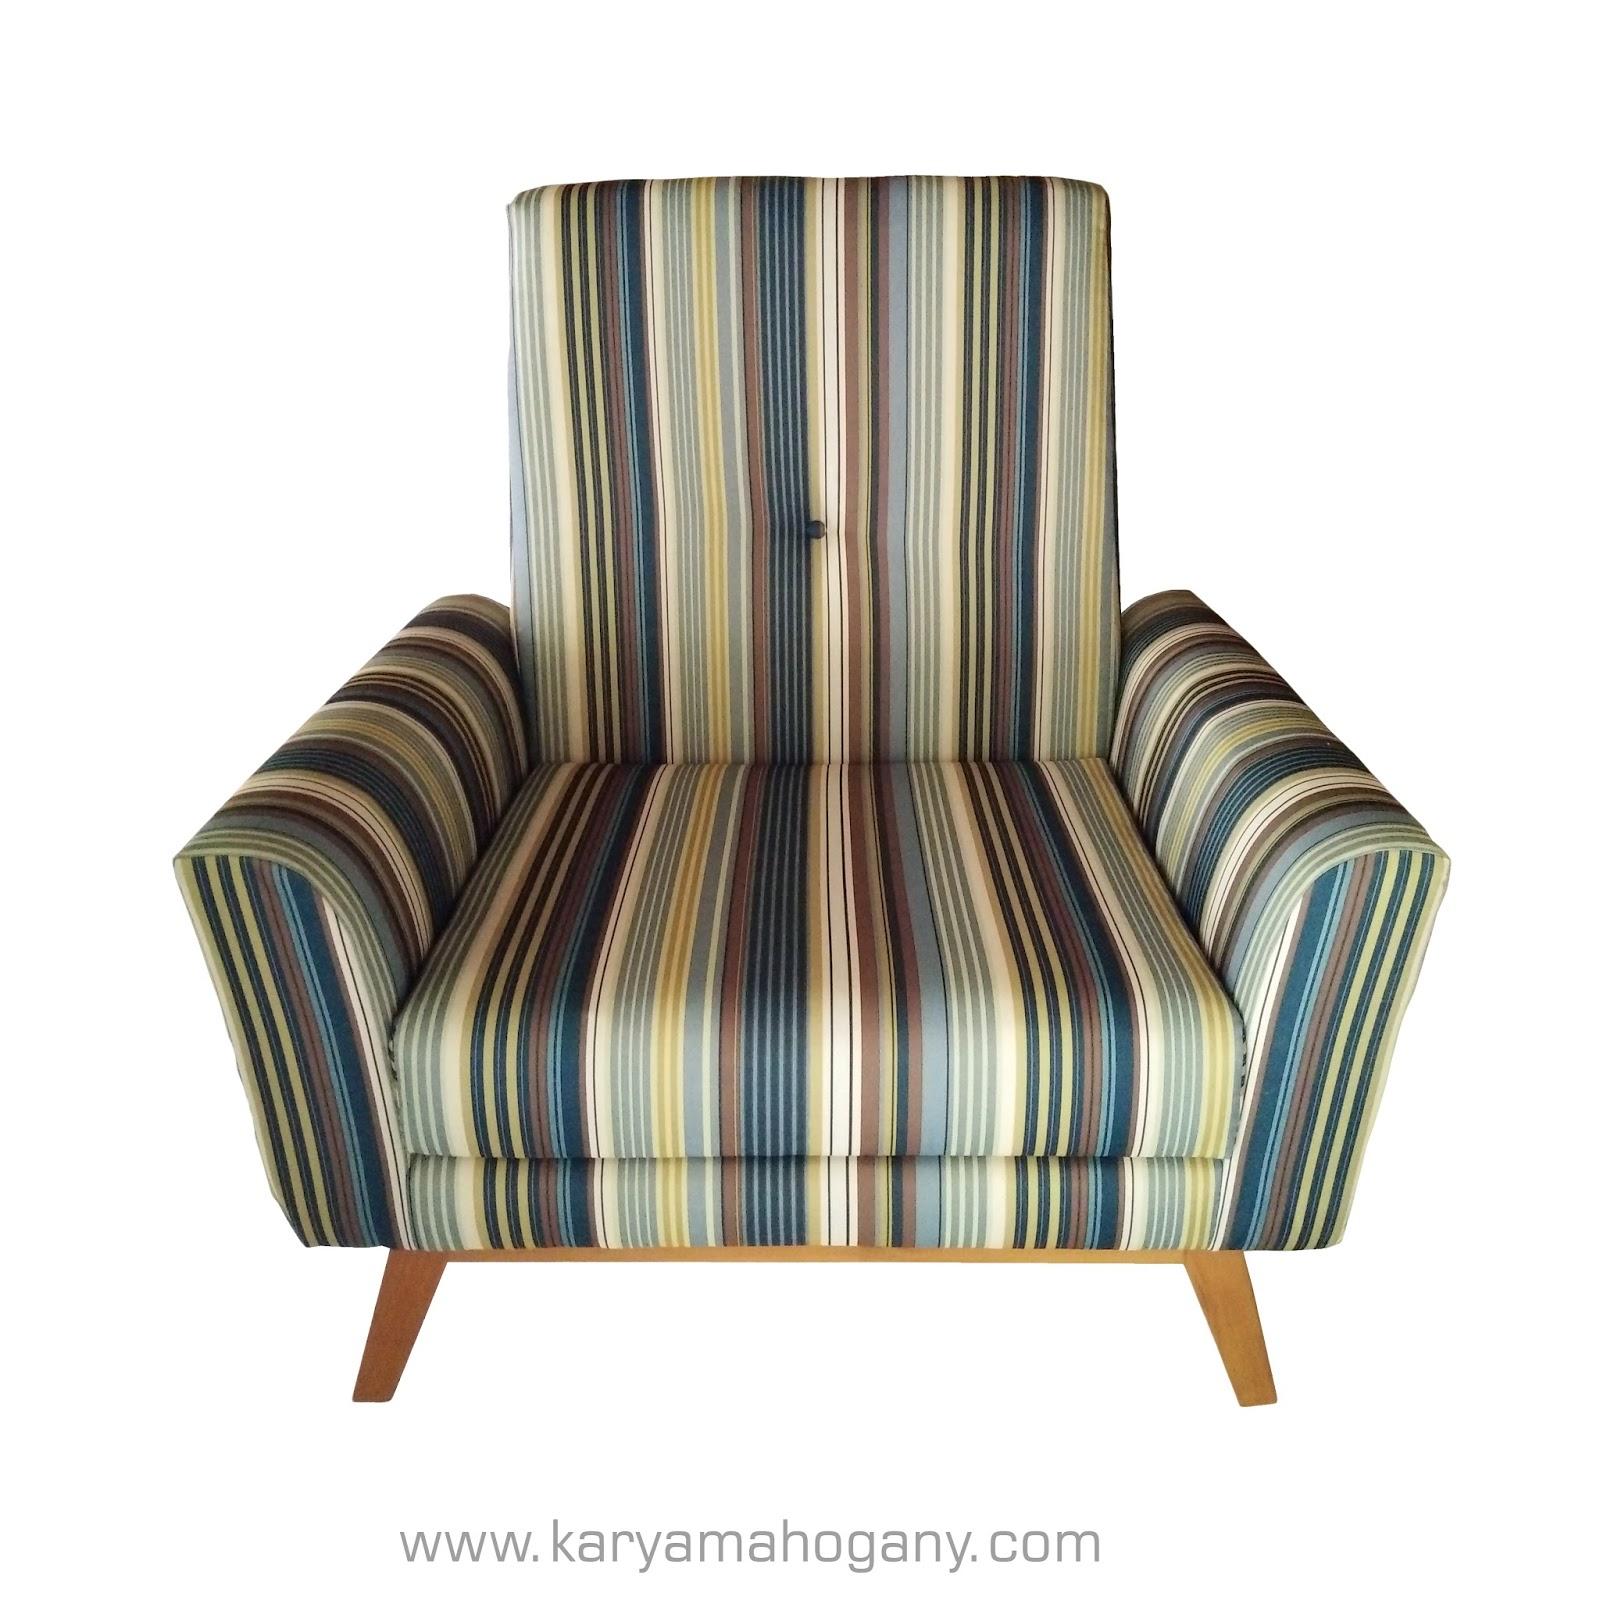 Kursi Sofa Minimalis Jepara | Kursi Tamu Minimalis Terbaru